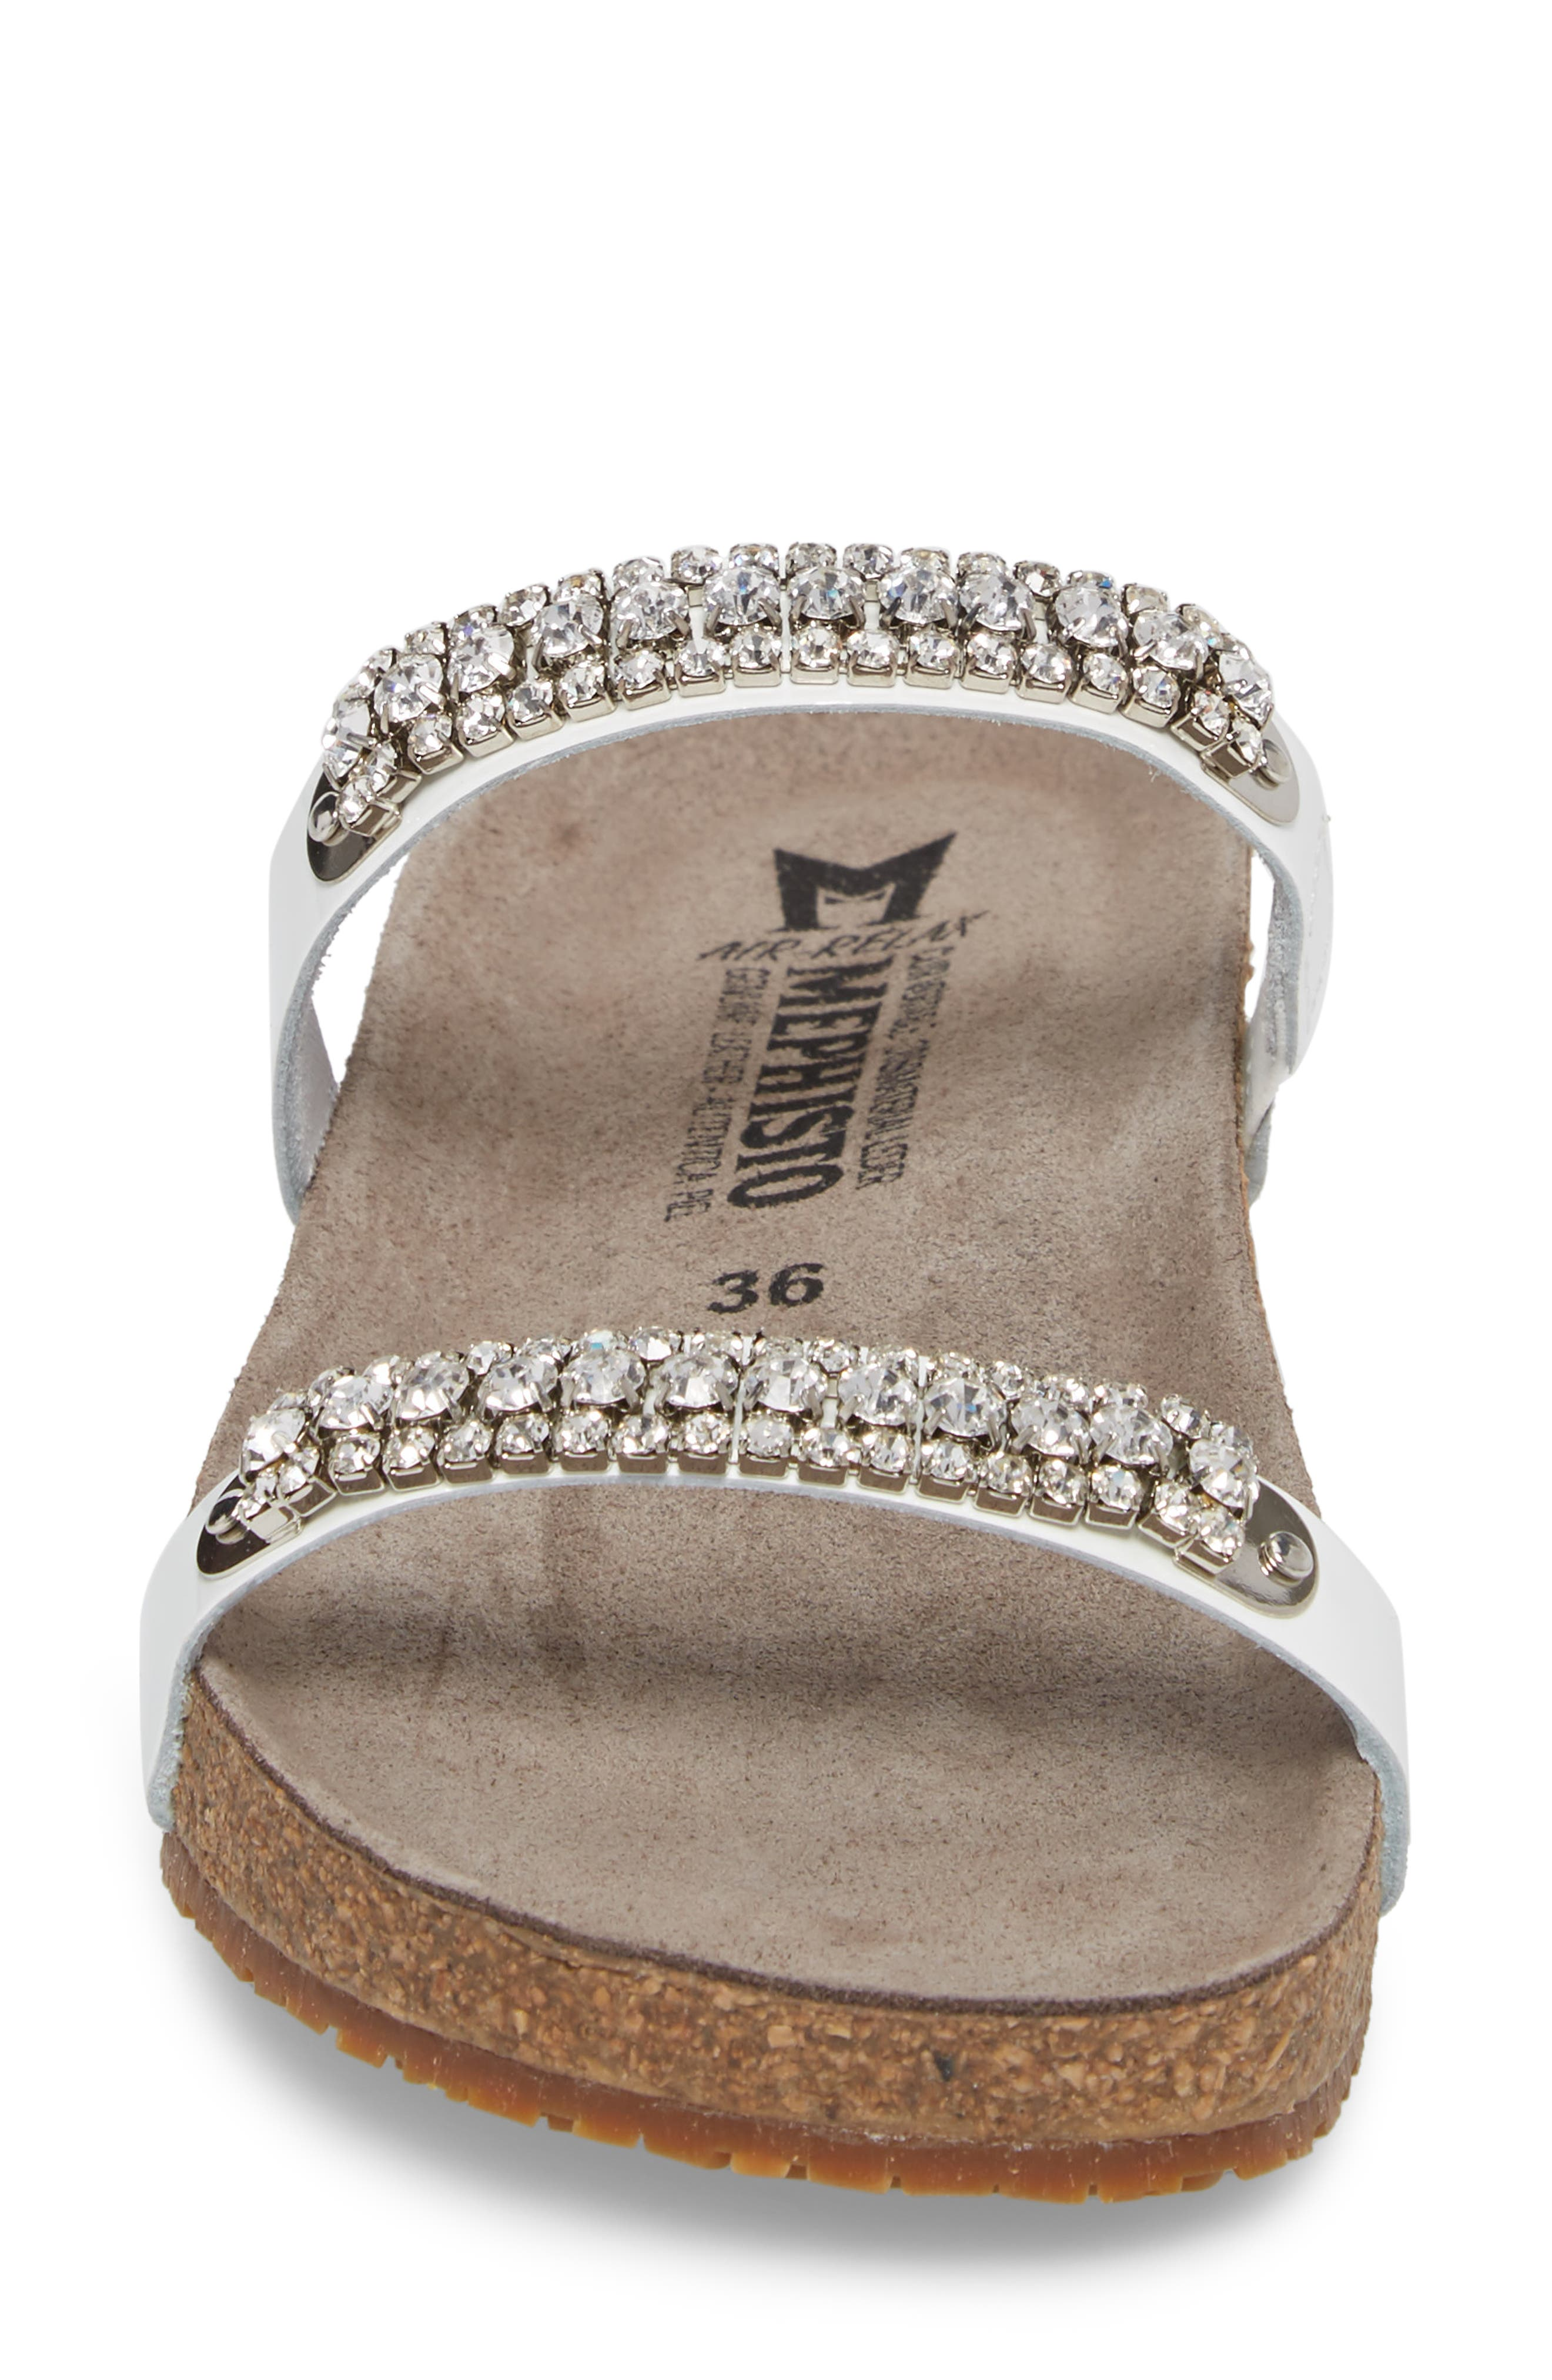 'Ivana' Crystal Embellished Slide Sandal,                             Alternate thumbnail 4, color,                             White Patent